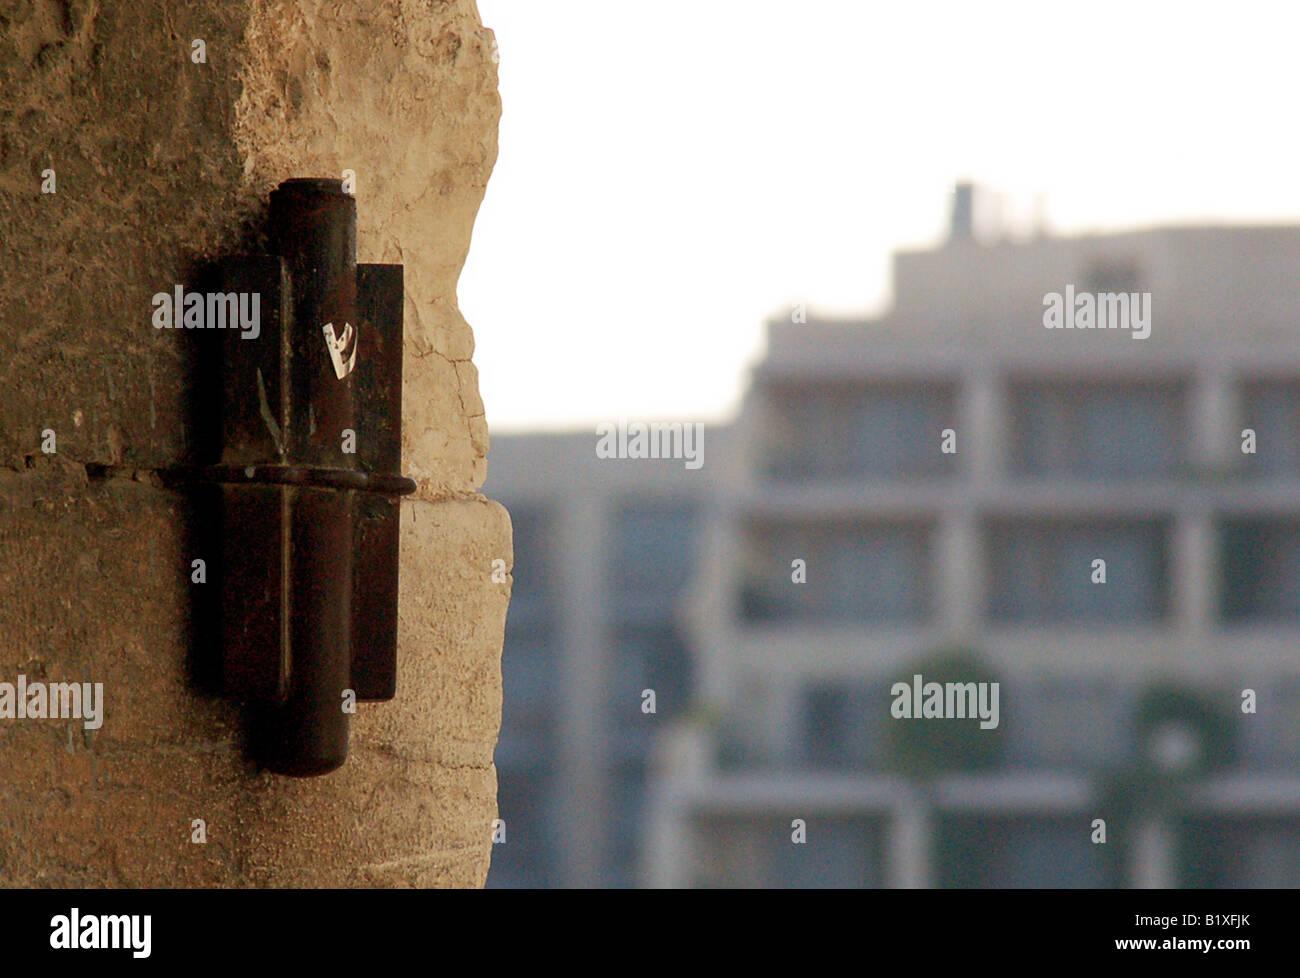 Jewish Doorpost Symbol Amp Mezuzah A Typical Jewish Symbol